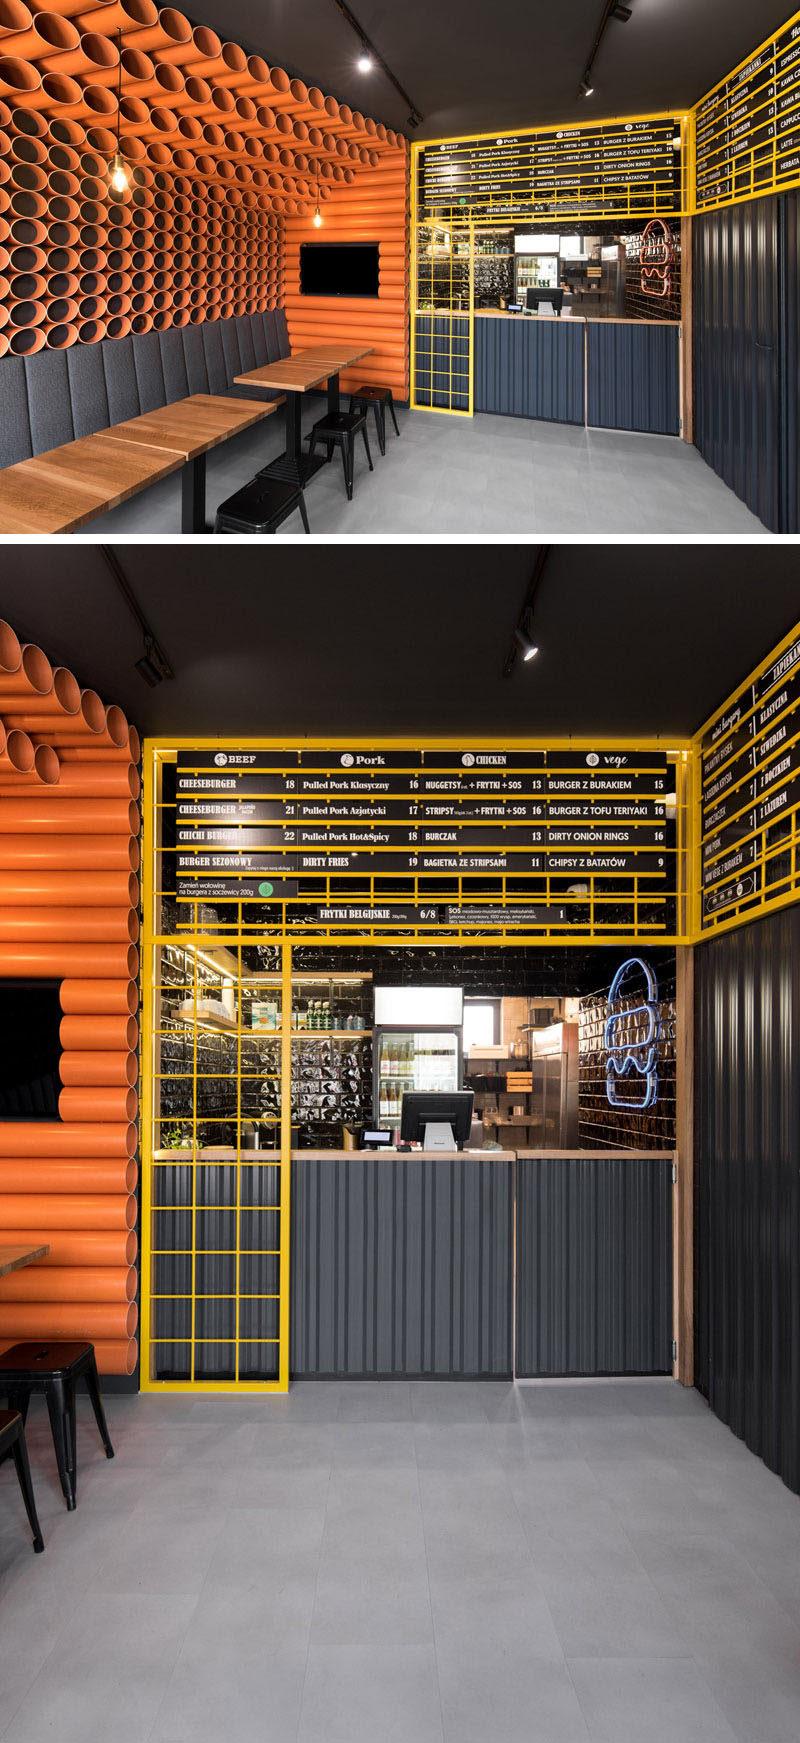 Design elements in this modern restaurant in orange PVC pipes, yellow mesh panels, dark corrugated metal sheet, wood accessories, and black tiles. #InteriorDesign #RestaurantDesign #RestaurantInterior #ModernRestaurant